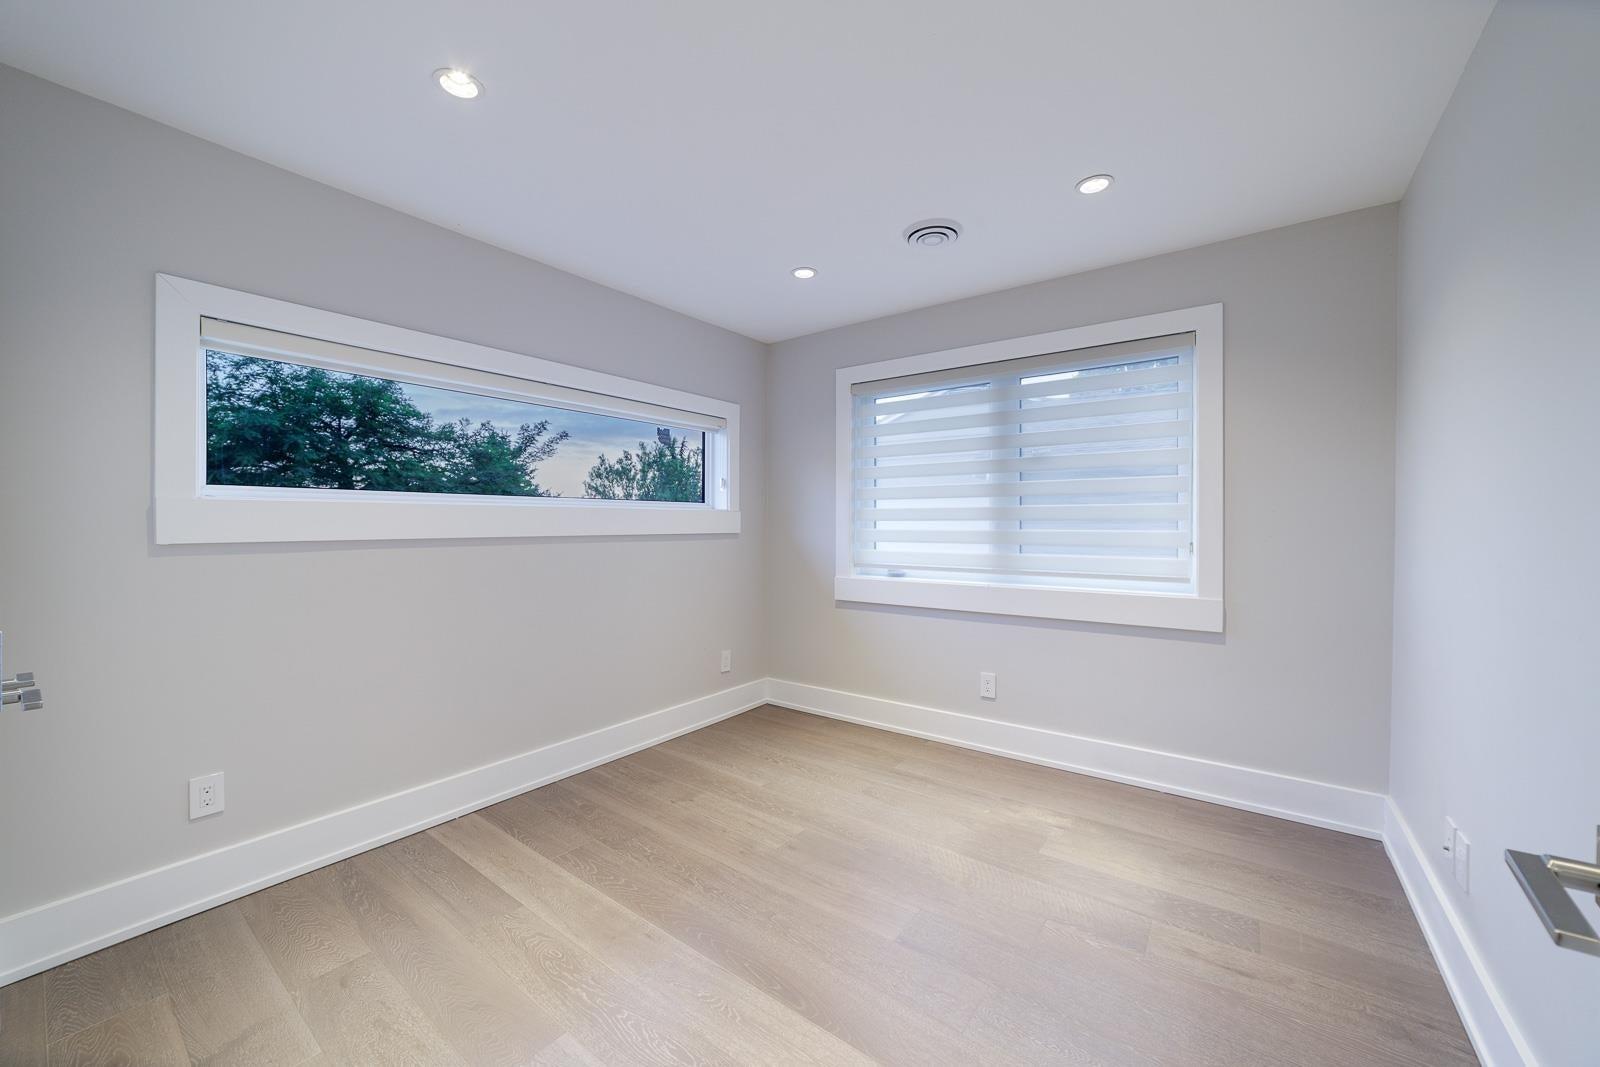 517 GRANADA CRESCENT - Upper Delbrook House/Single Family for sale, 8 Bedrooms (R2615057) - #23